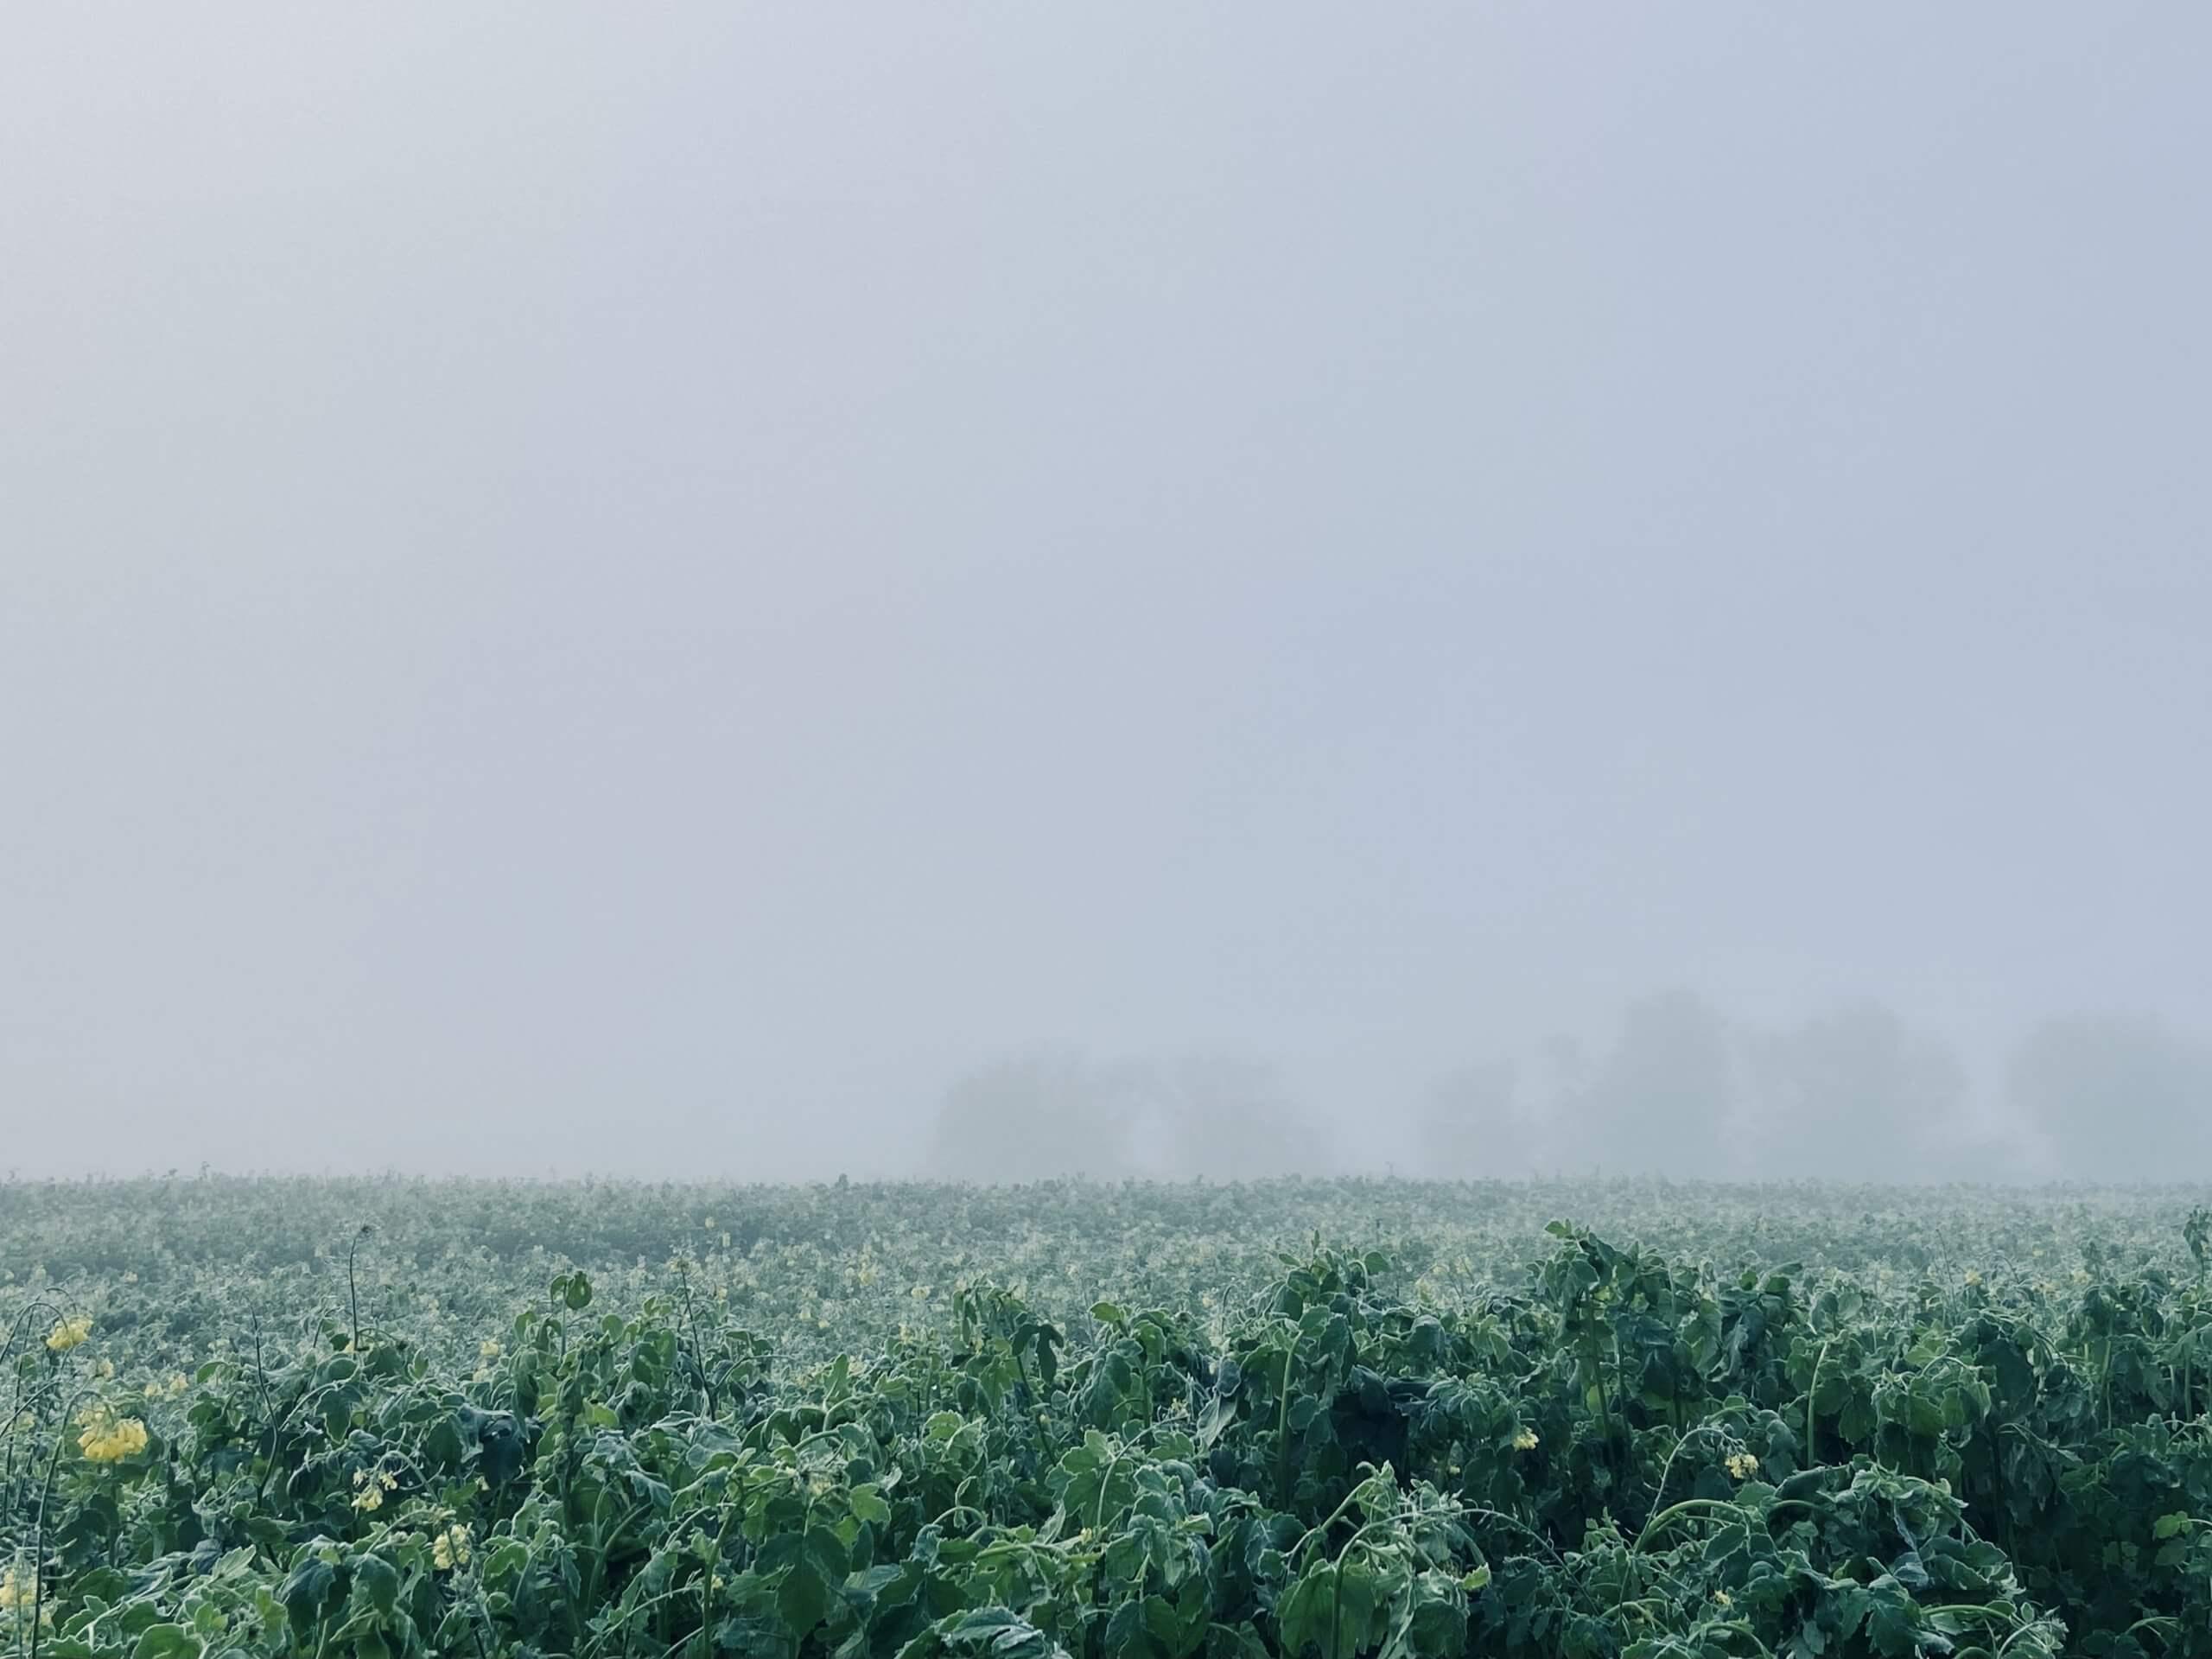 Nebel aufm Feld